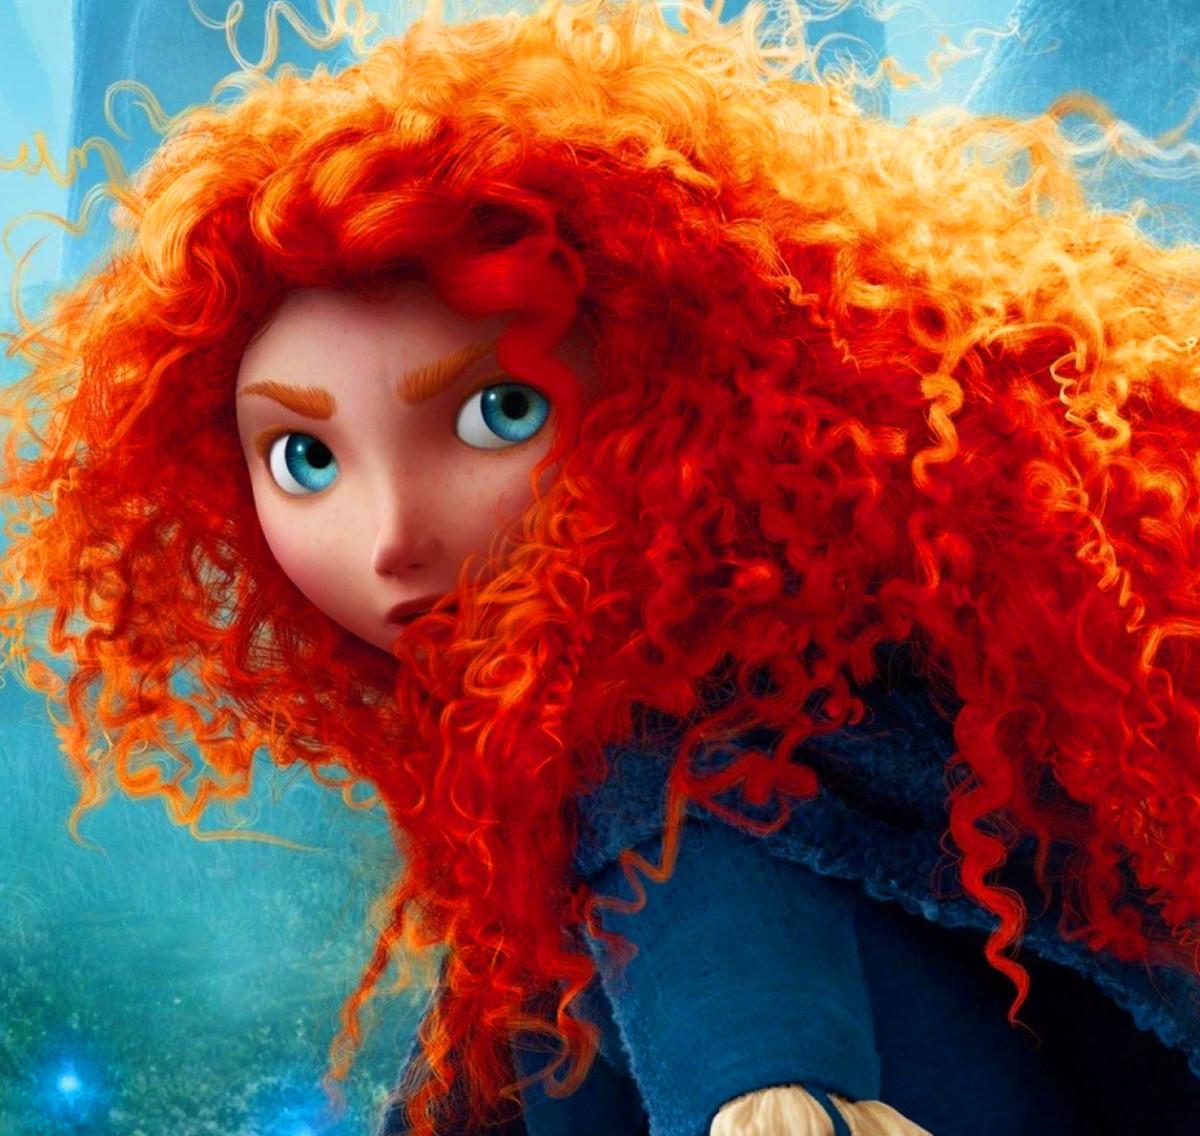 Emo Girl Wallpaper 2012 F Is For Flame Buoyant How Pixar Made Merida S Brave Hair